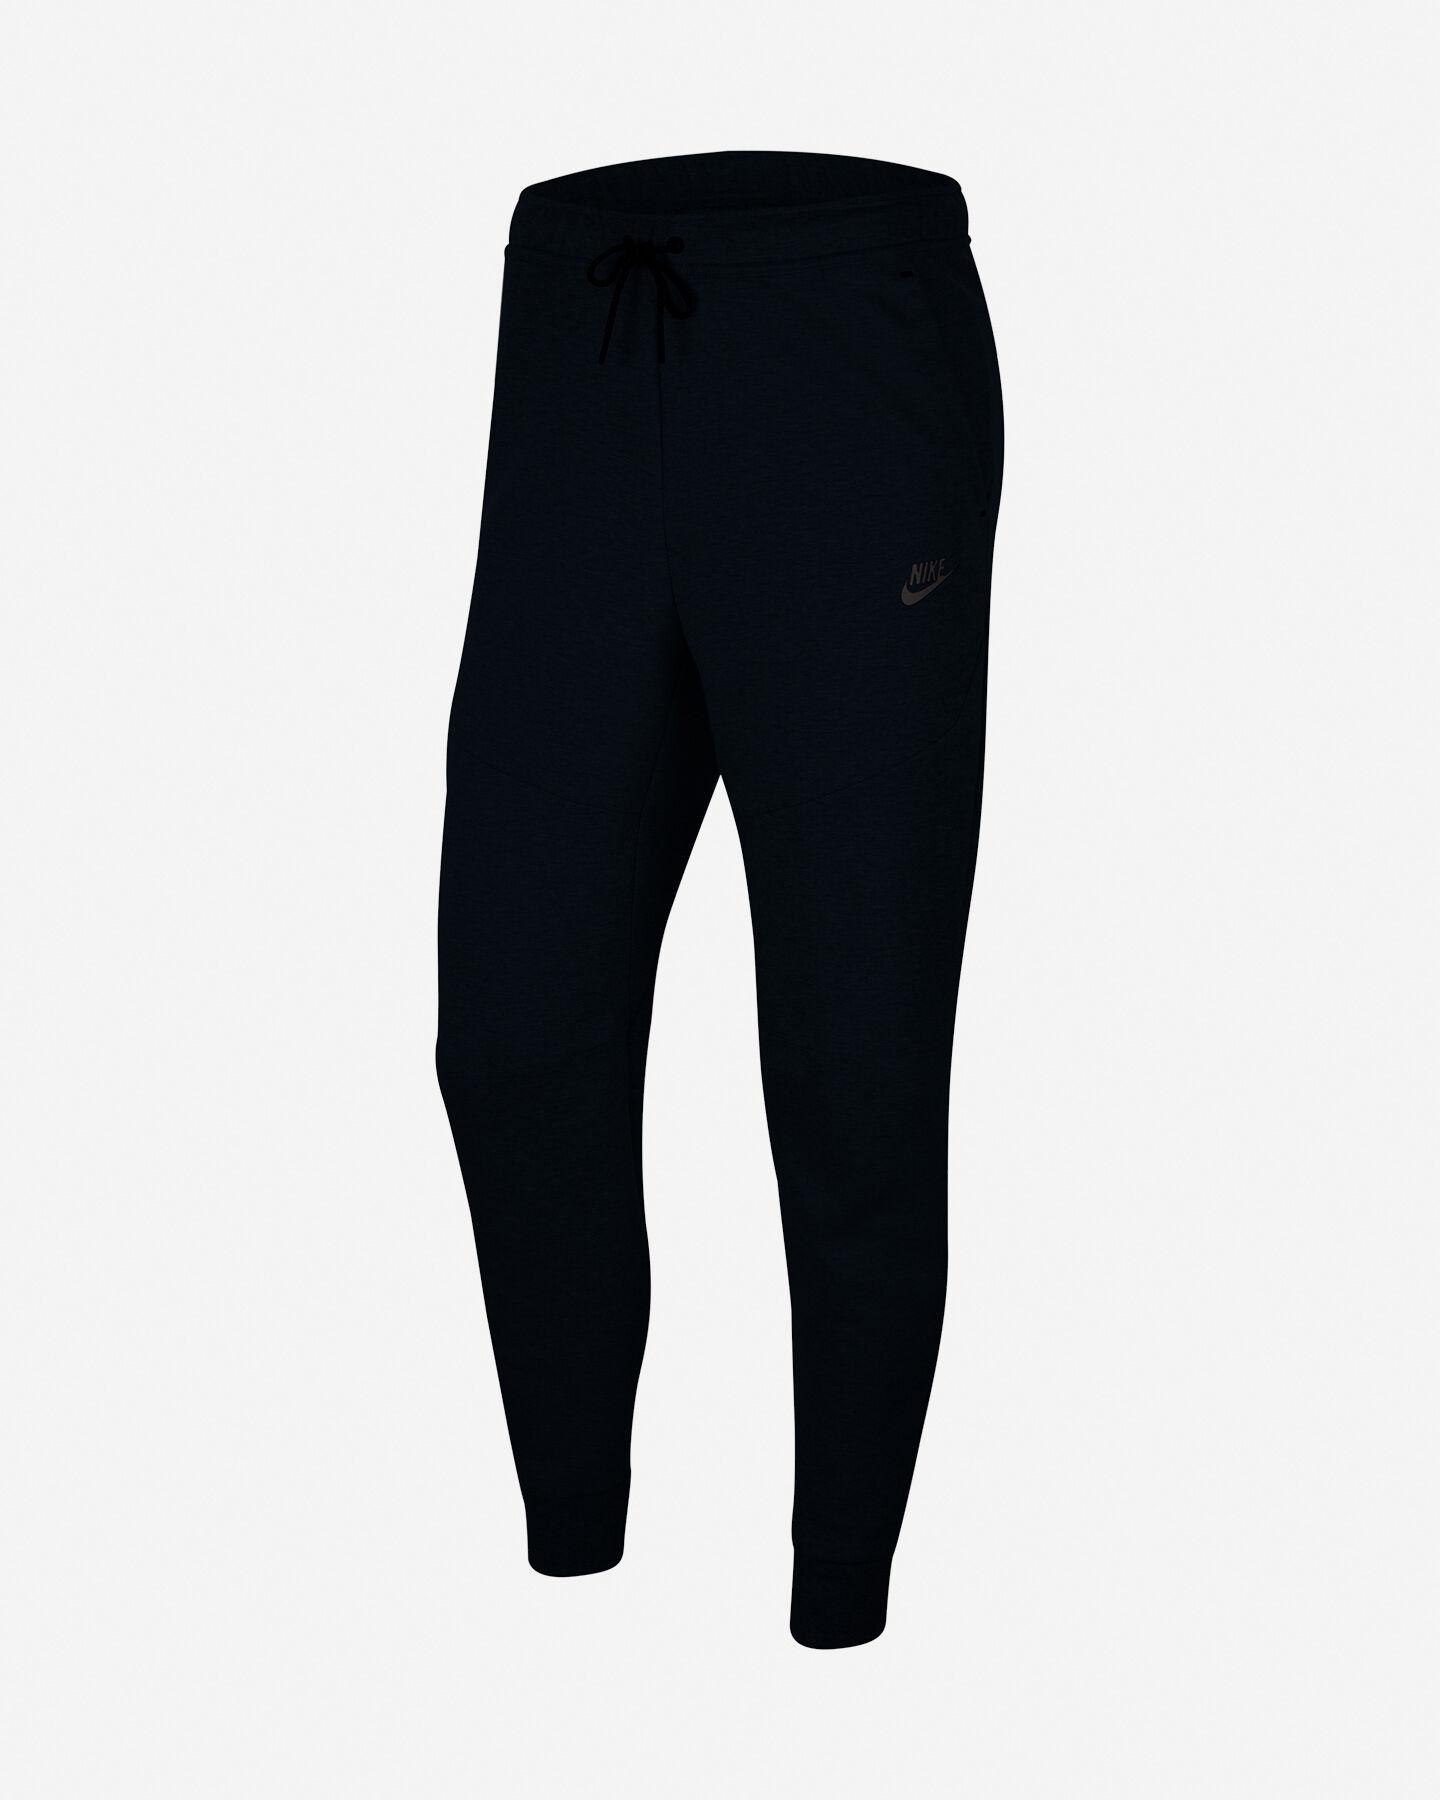 Pantalone NIKE TECH FLEECE M S5223279 scatto 0